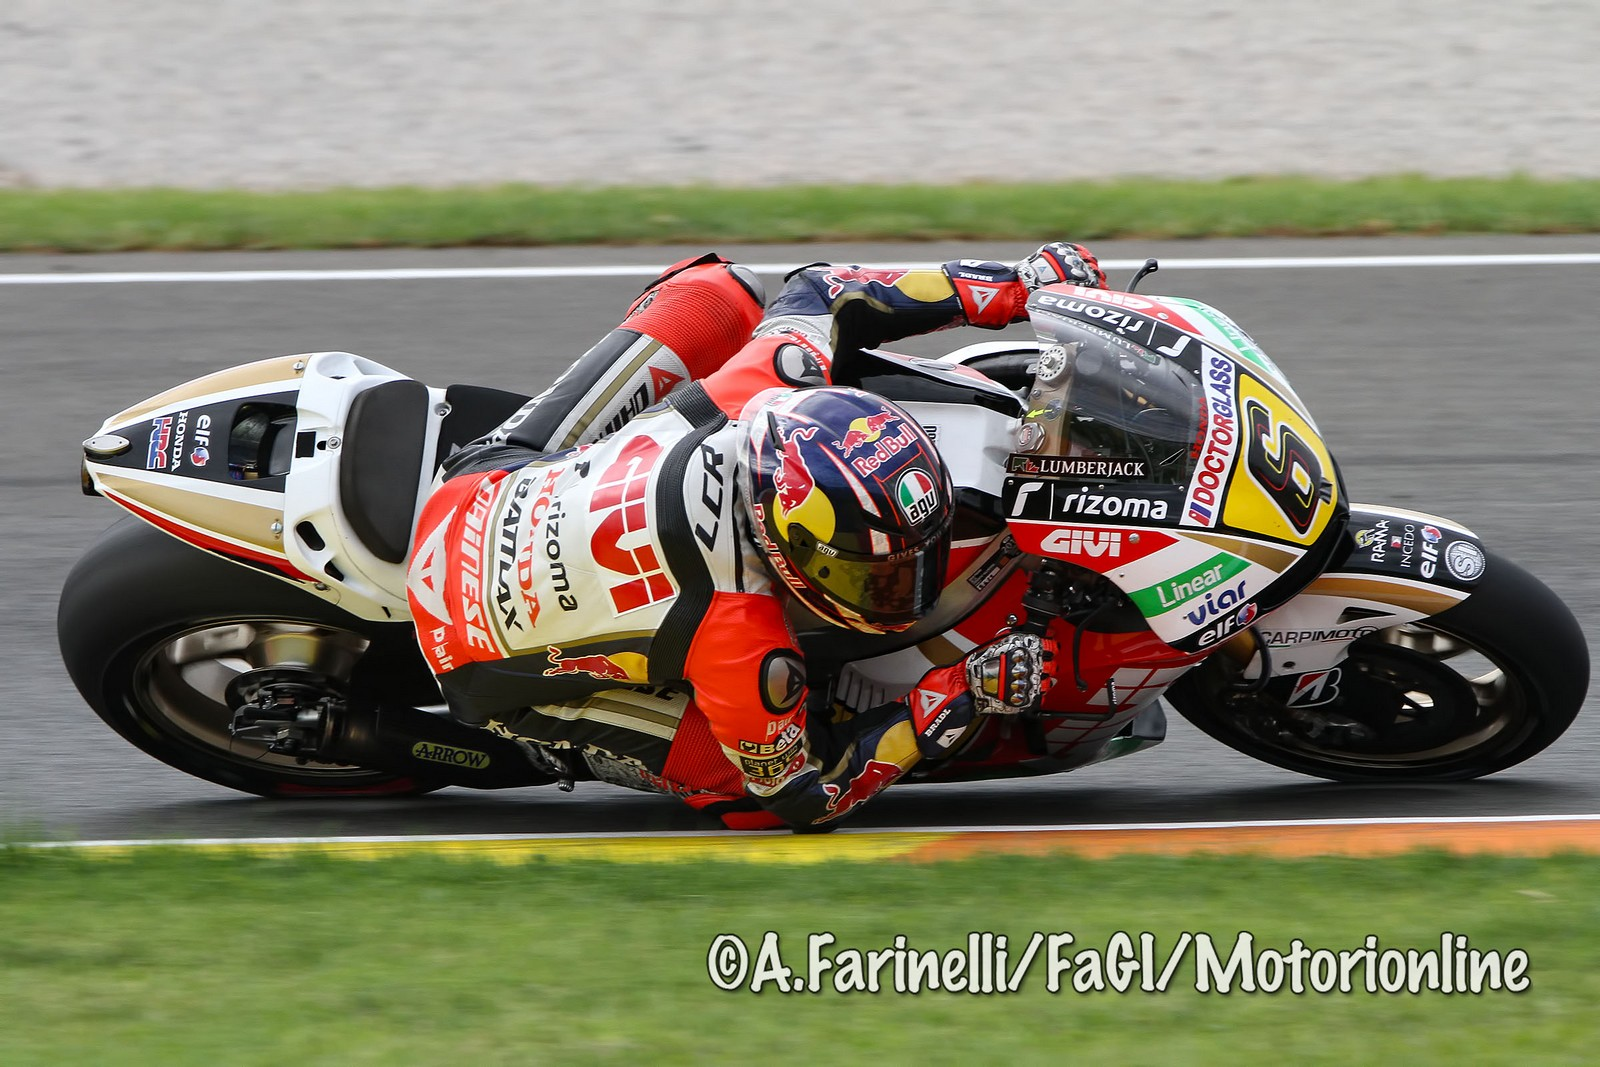 Moto GP Sports Betting Sites